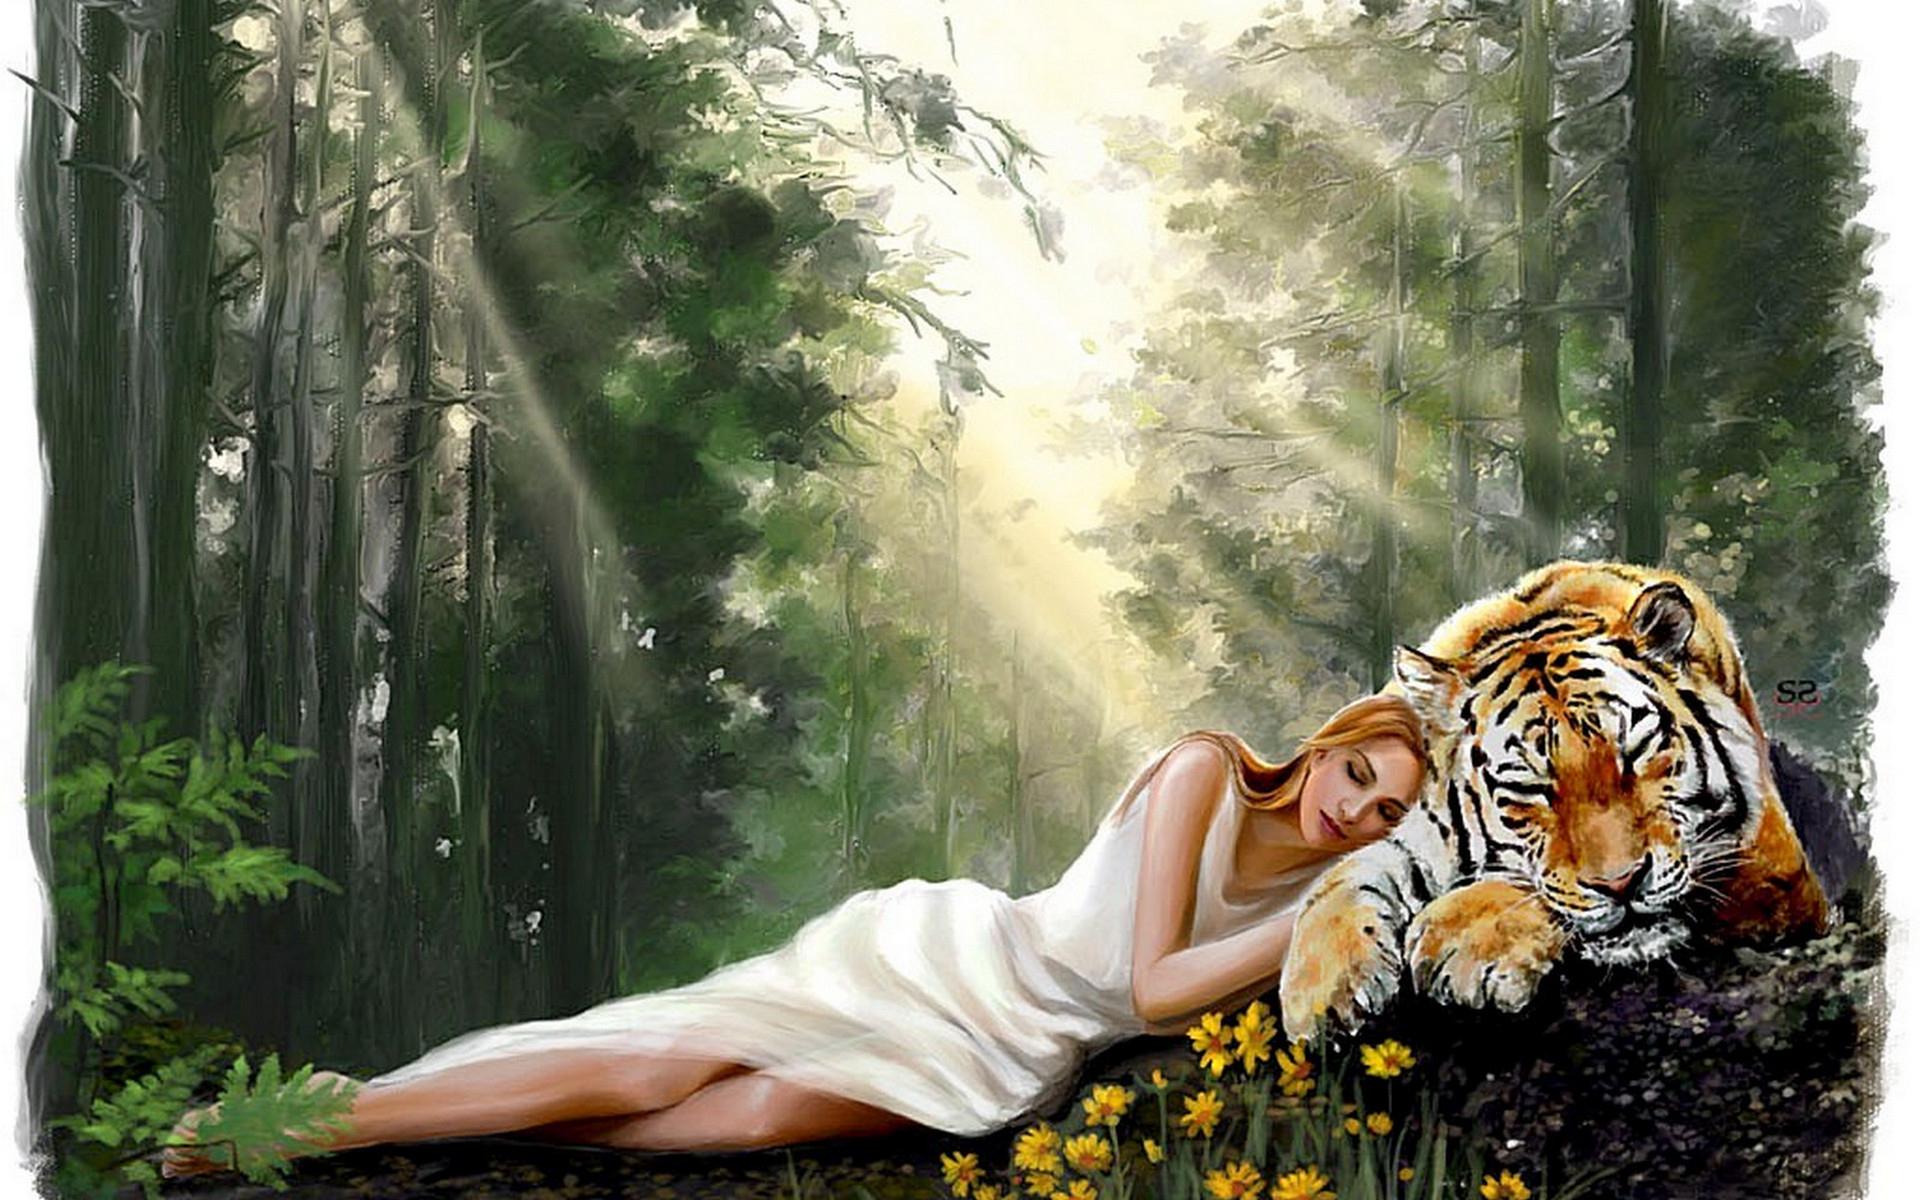 обои лес, девушка, лежит, тигр картинки фото